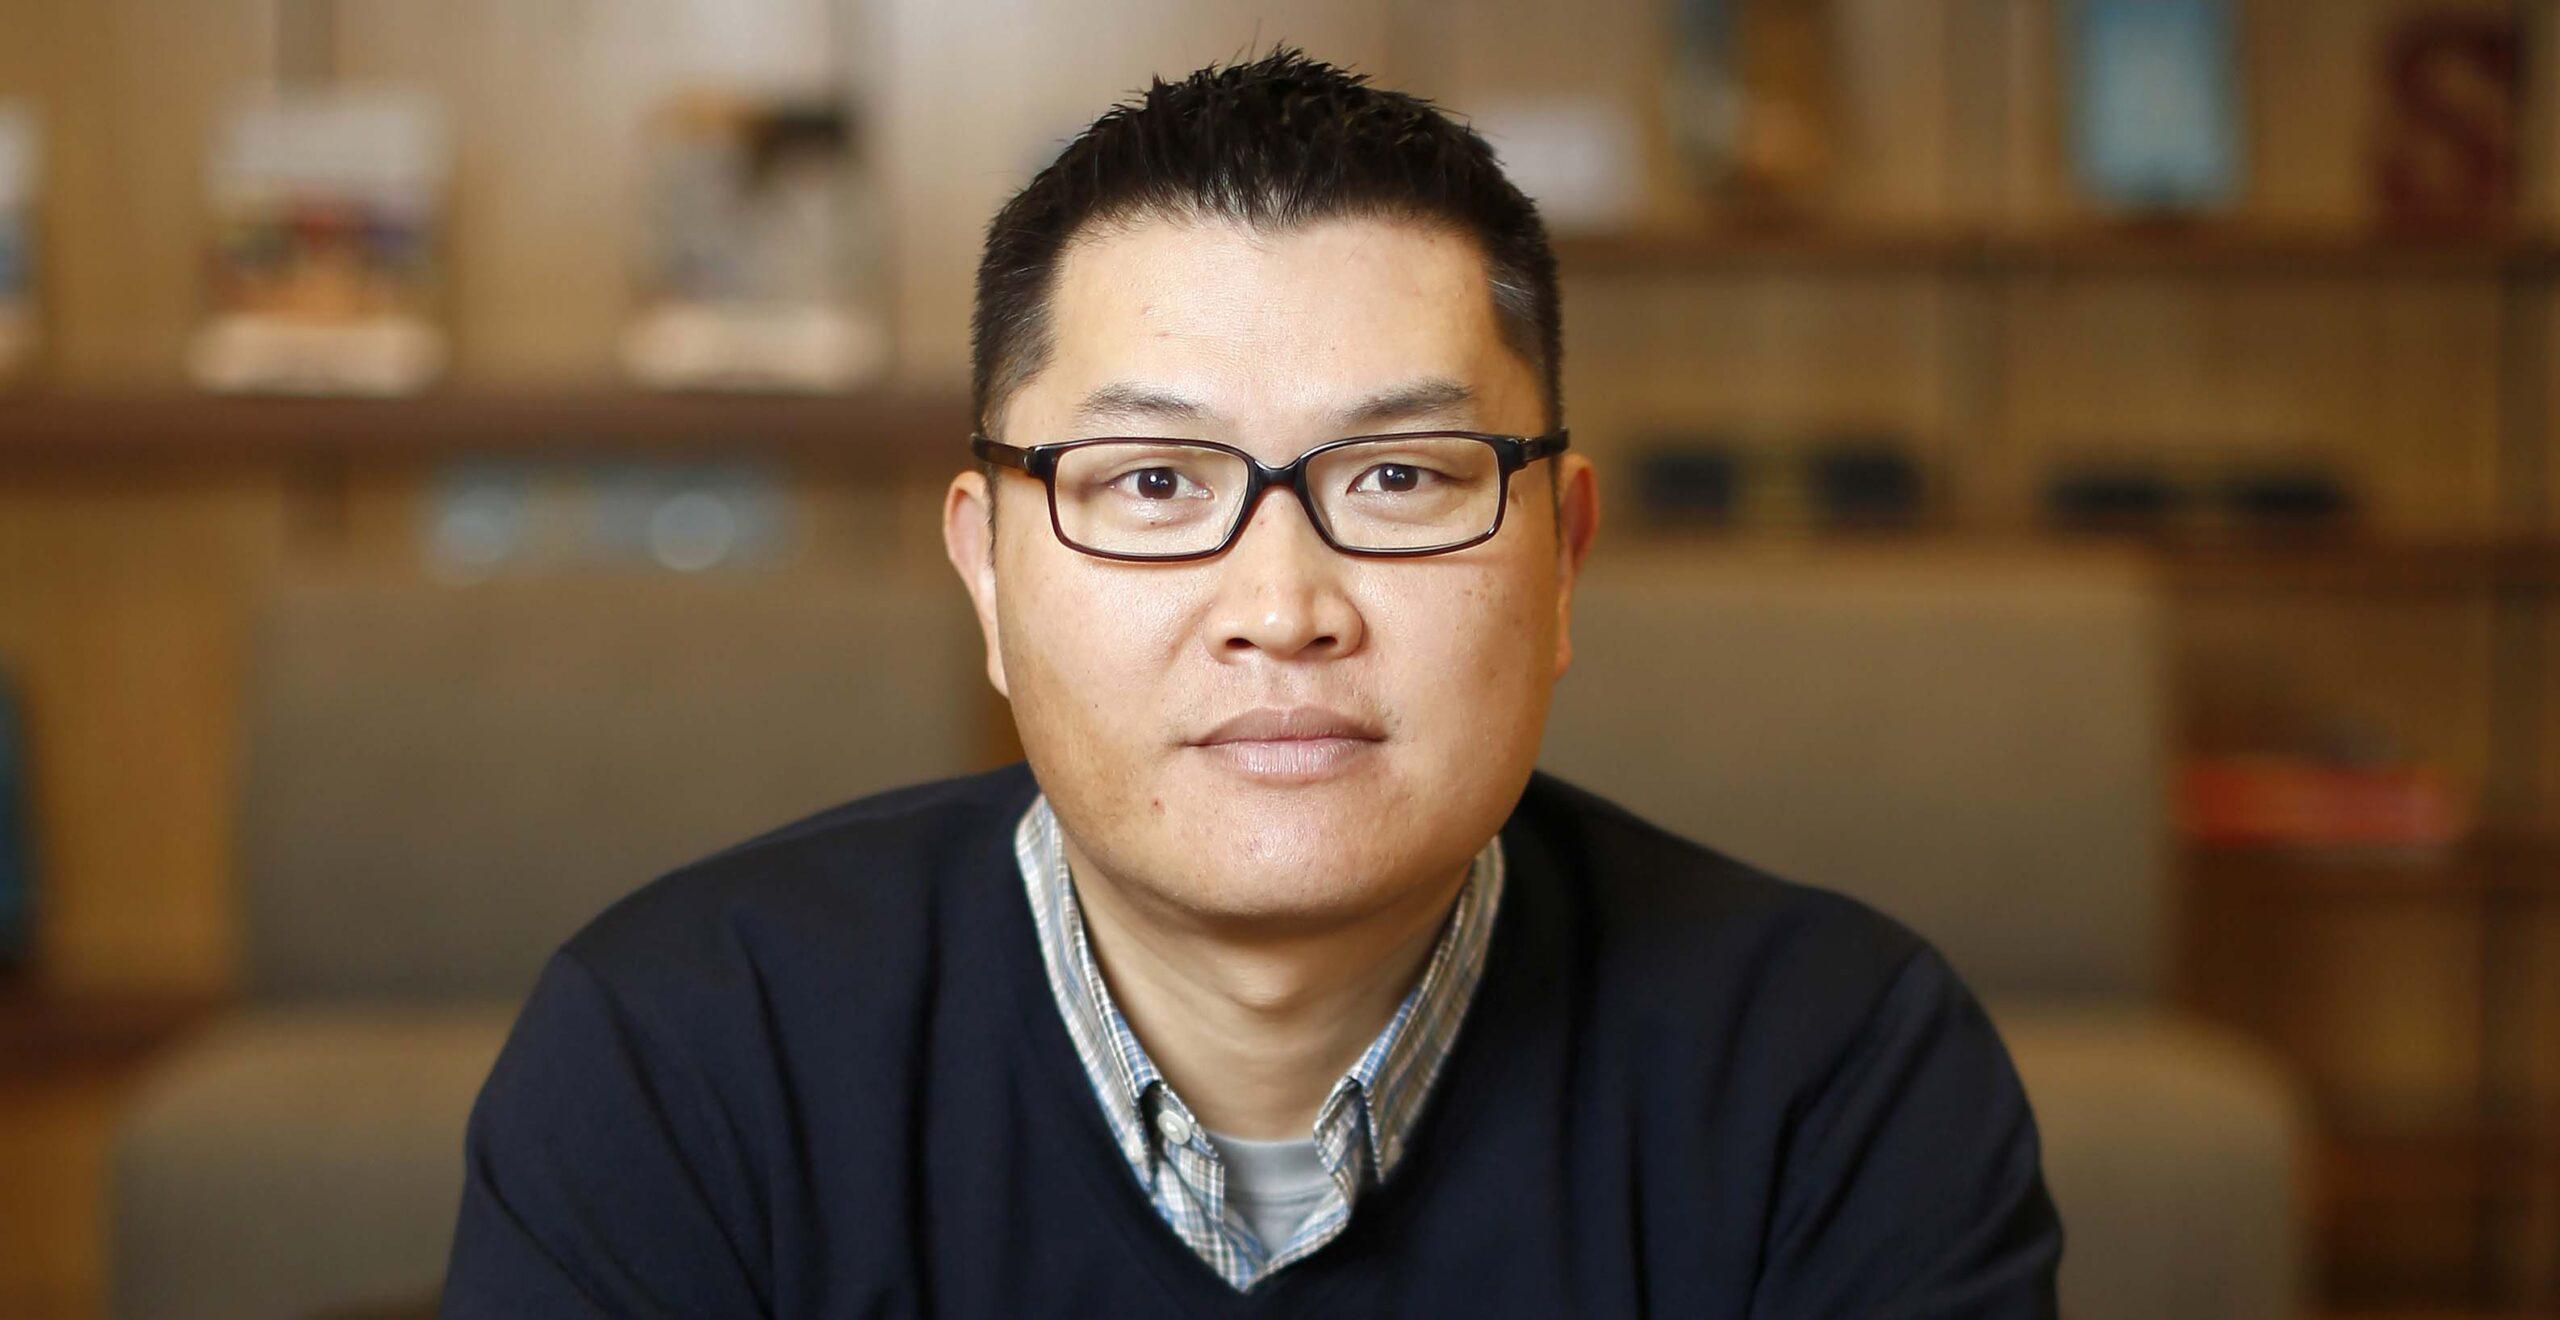 Kitt Carpenter wins University award for diversity and inclusion